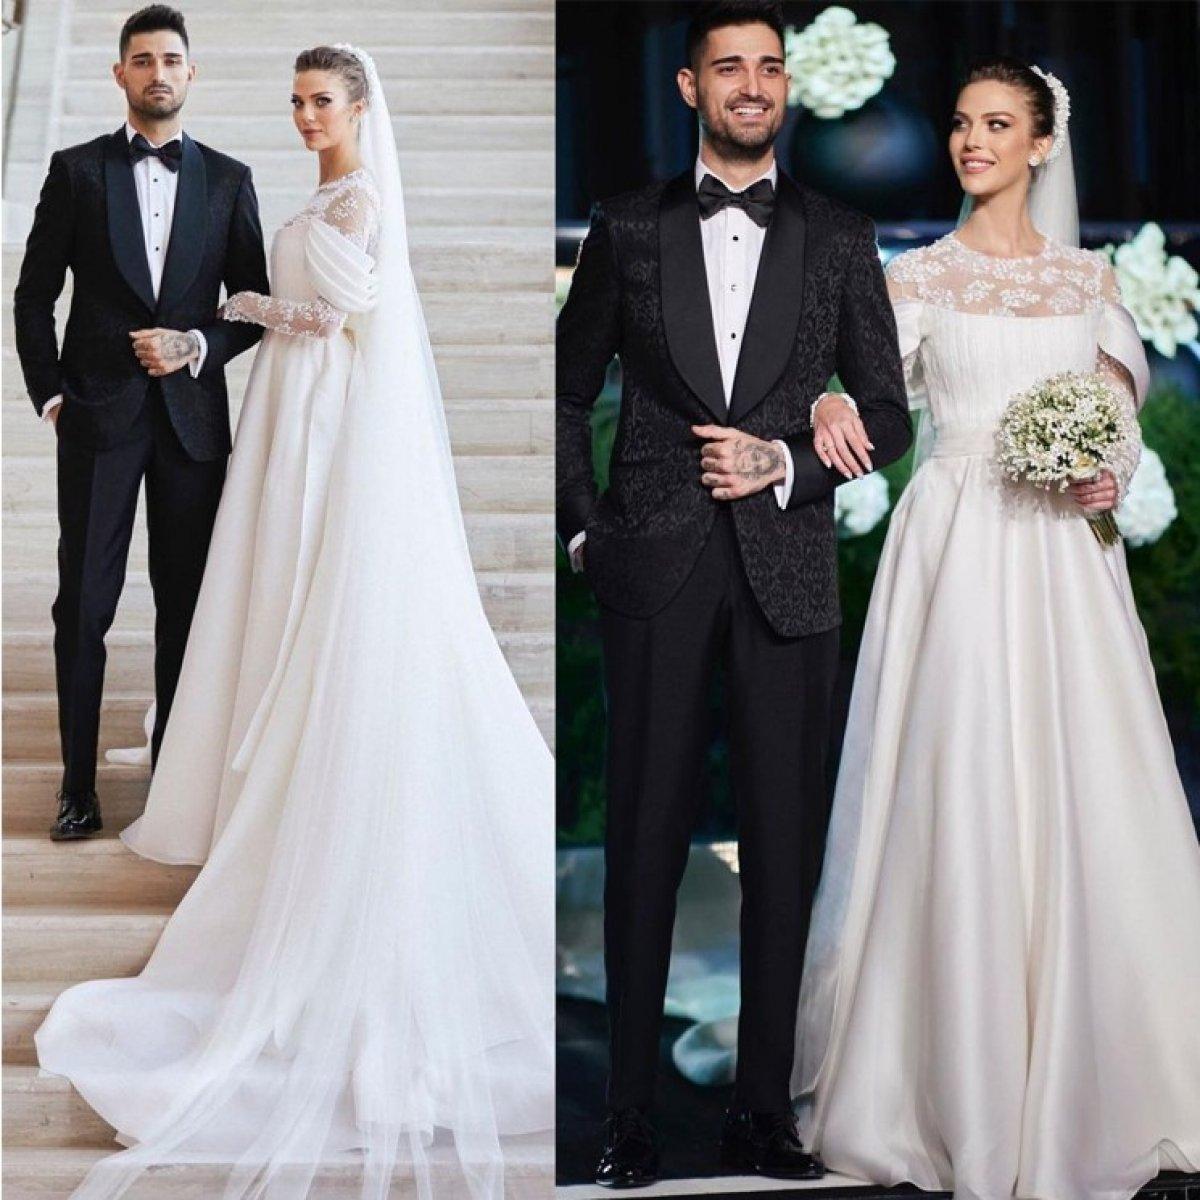 İdo Tatlıses, Yasemin Şefkatli ile evlendi #2